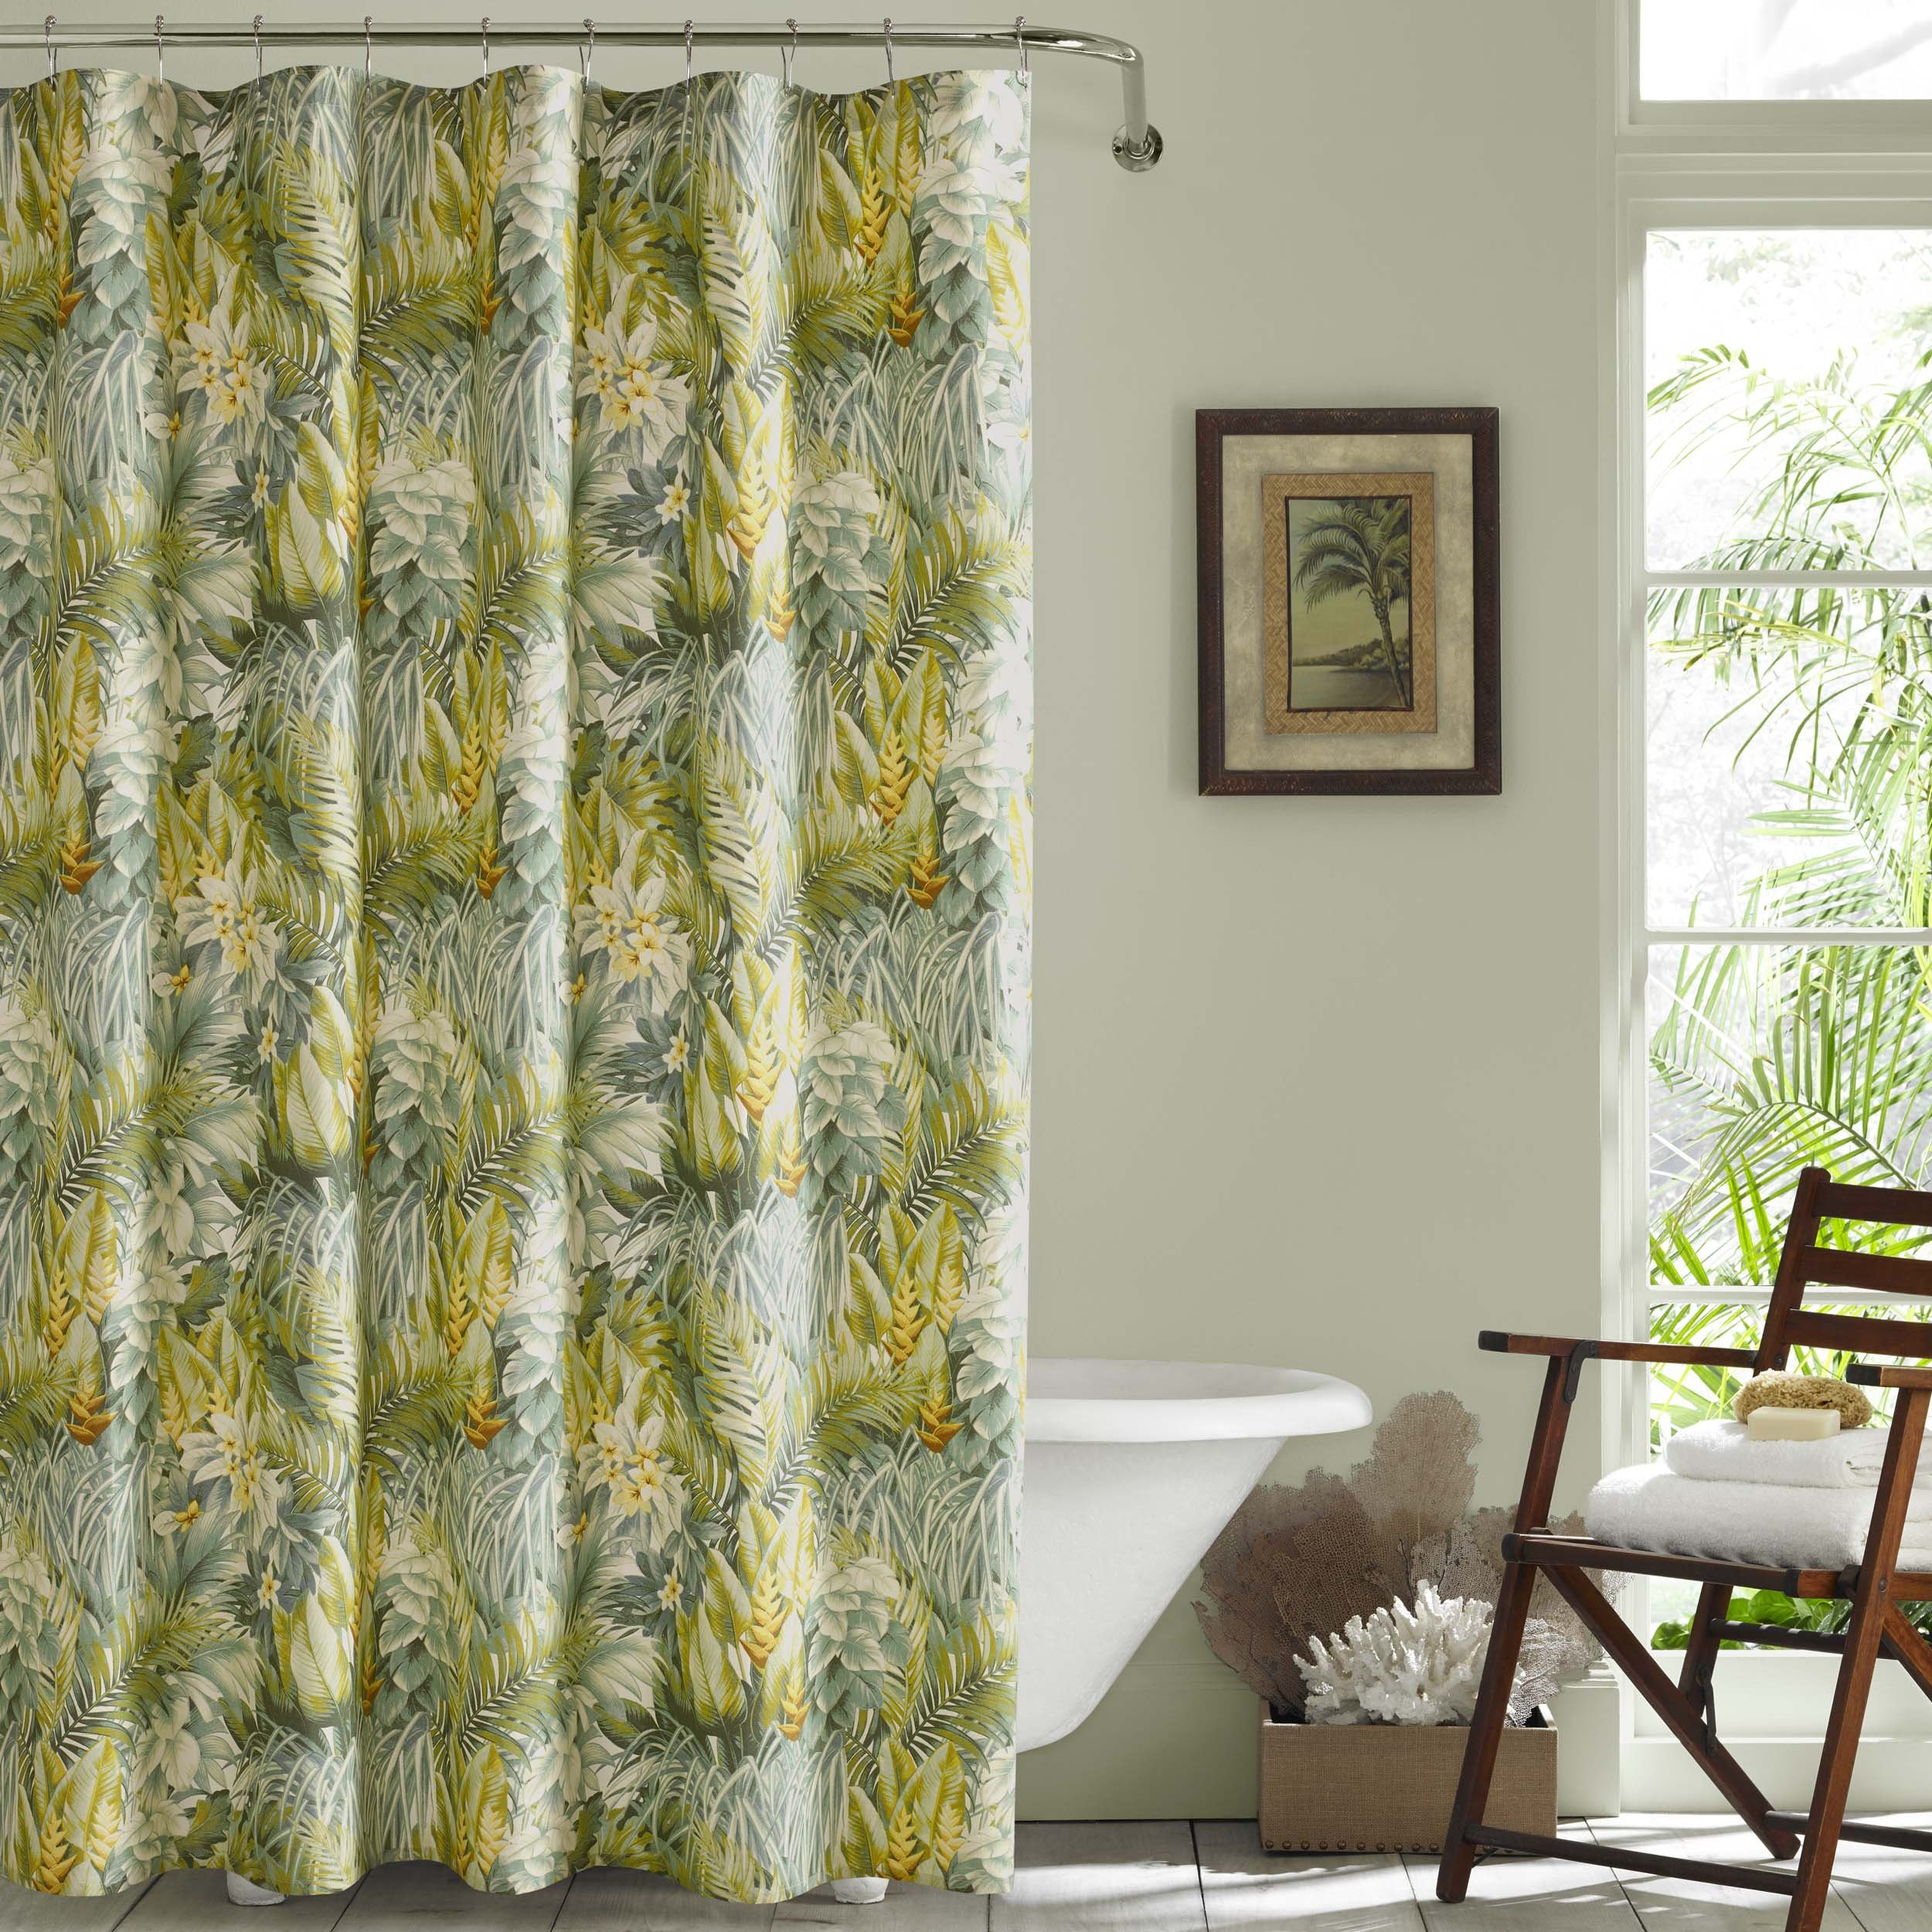 Tommy Bahama Cuba Cabana Shower Curtain 72'' x 72'' Medium Green